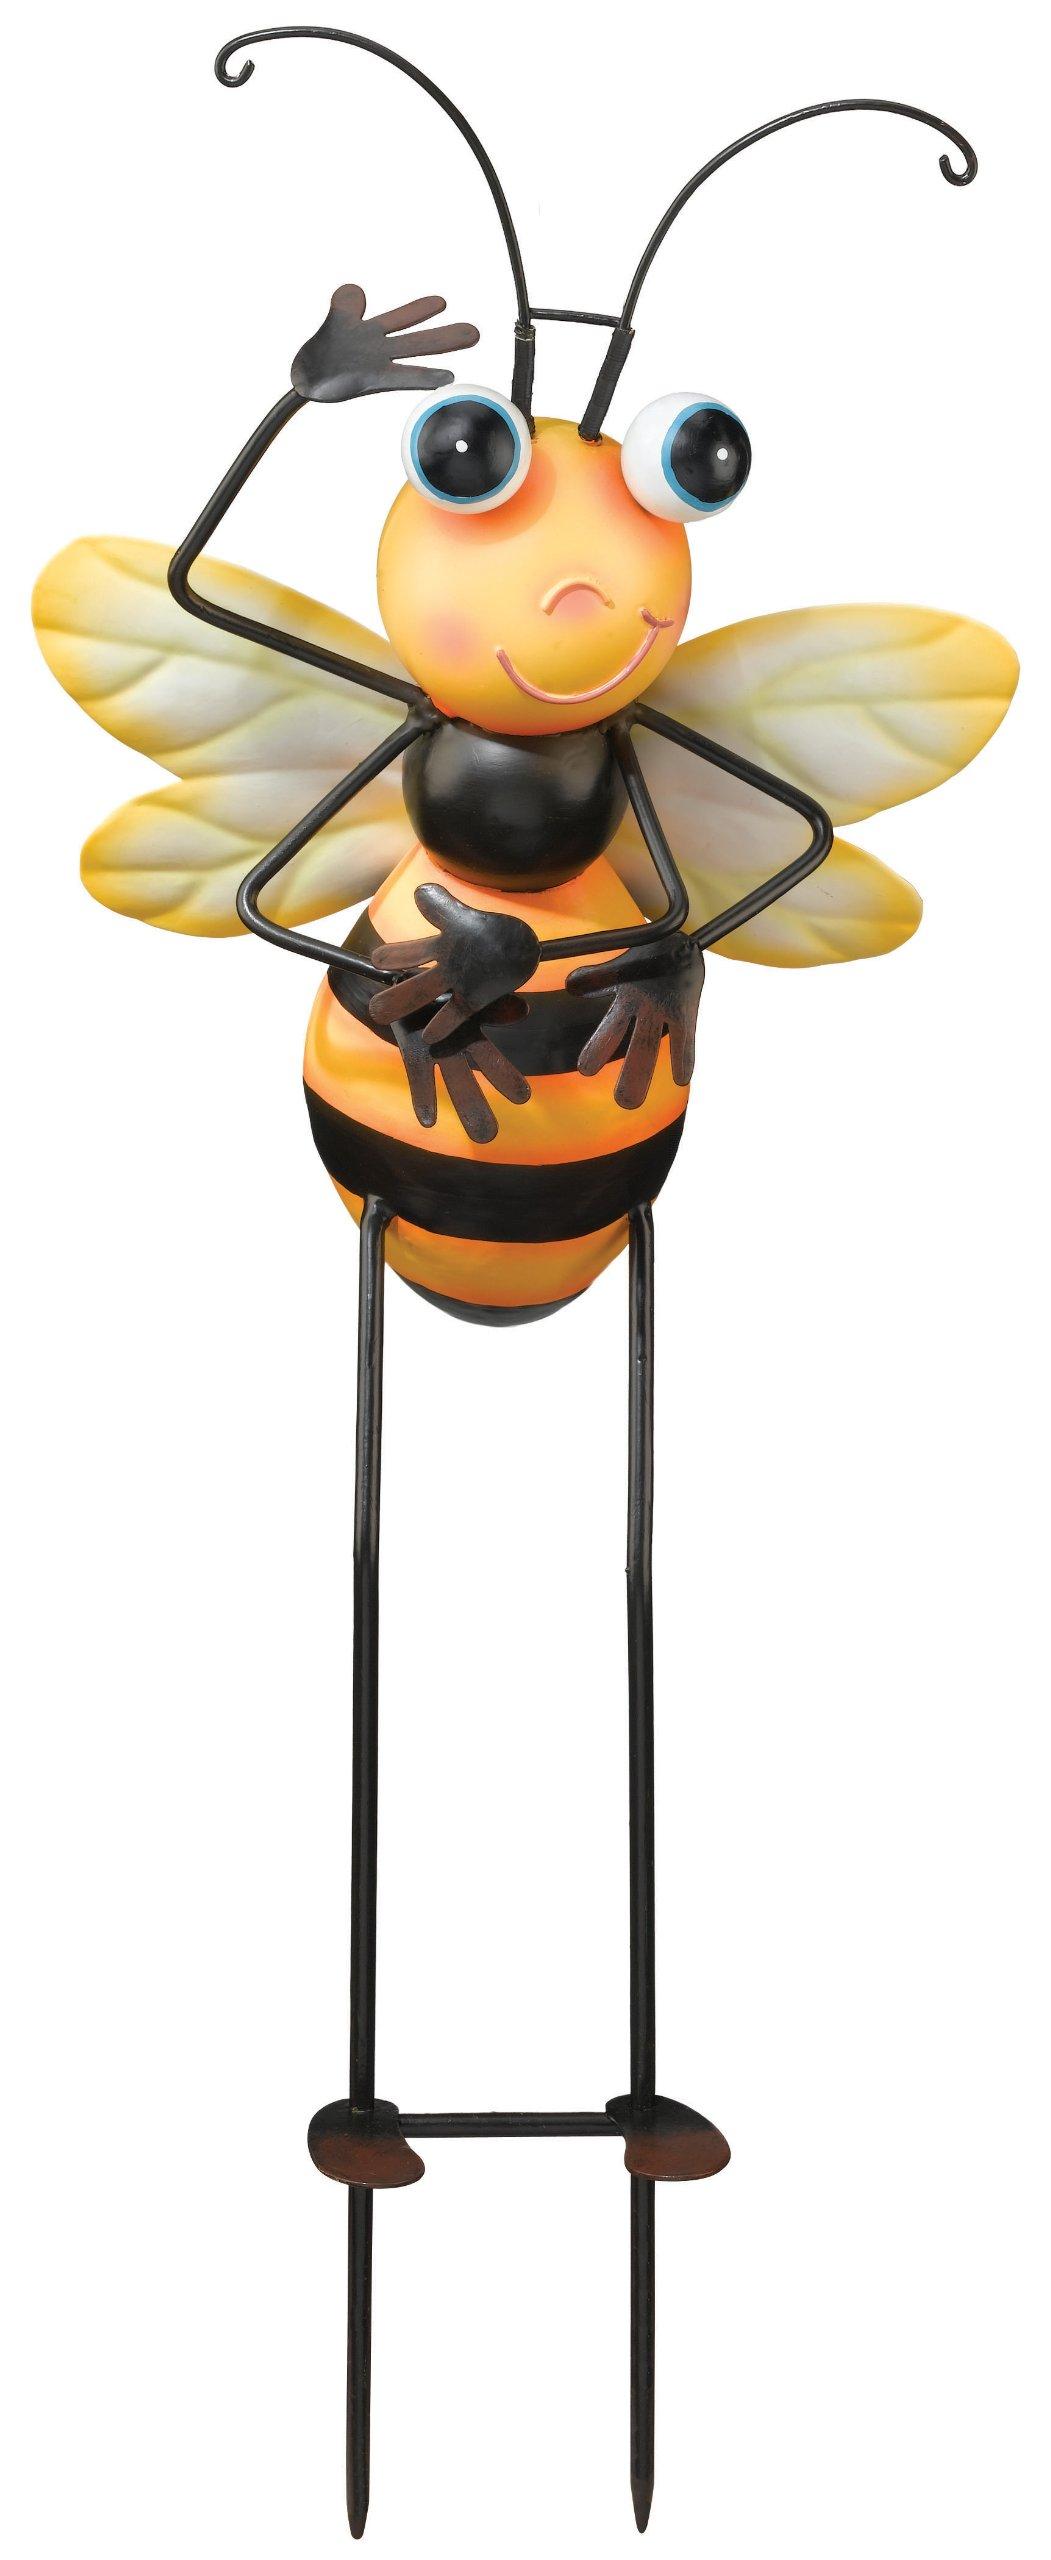 Regal Art & Gift 10001 Bee Garden Stake, Small